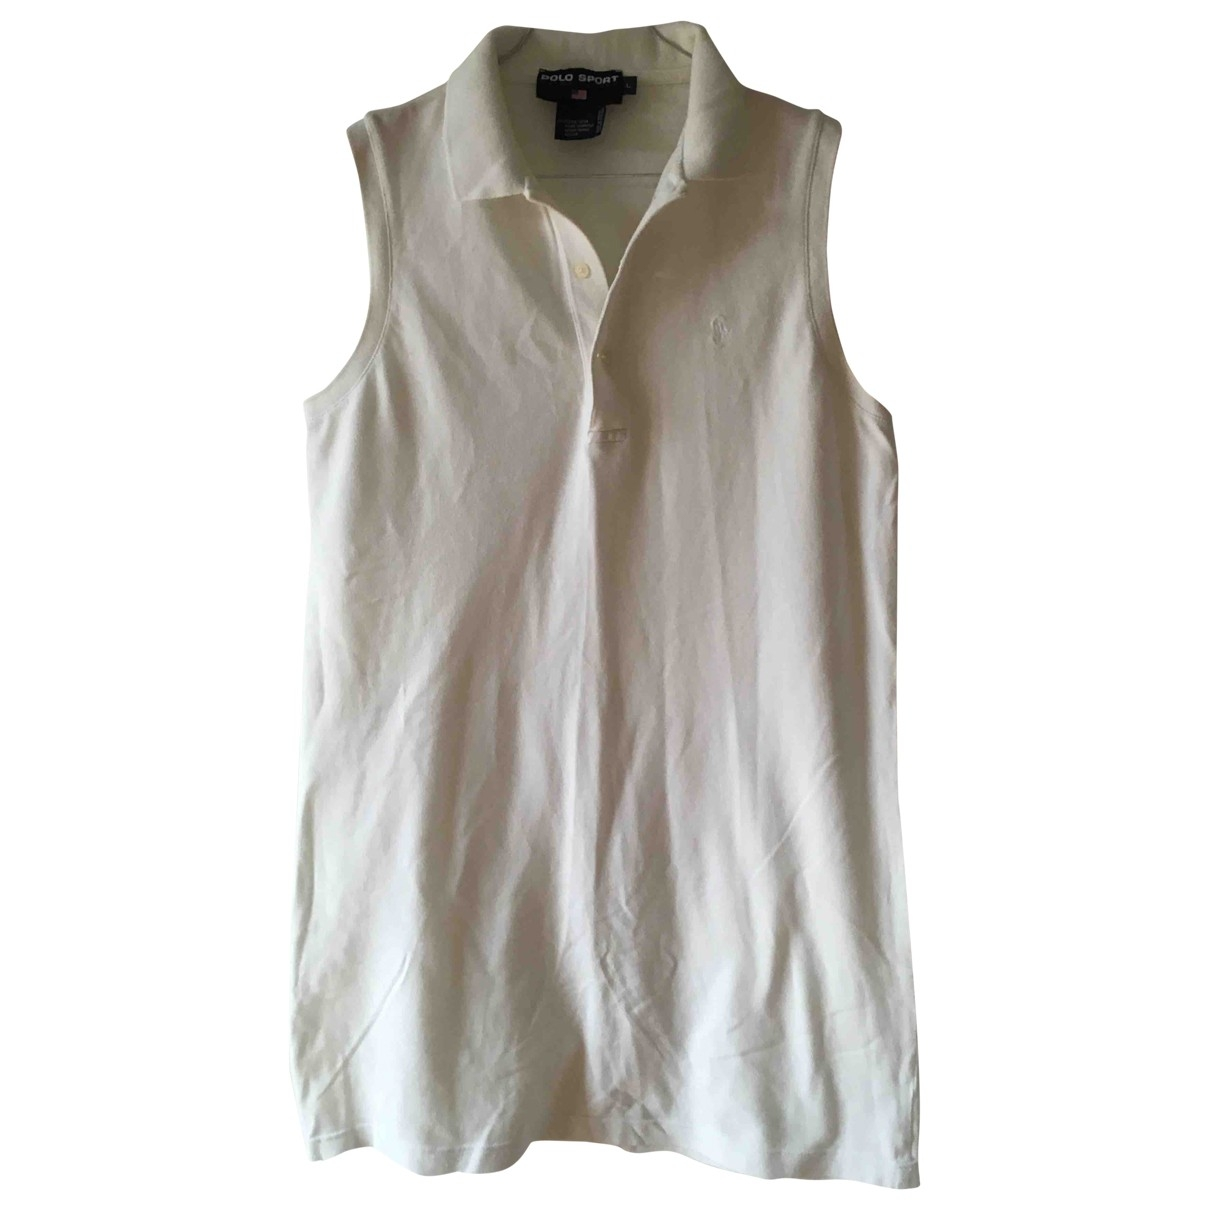 Polo Ralph Lauren \N White Cotton dress for Women L International